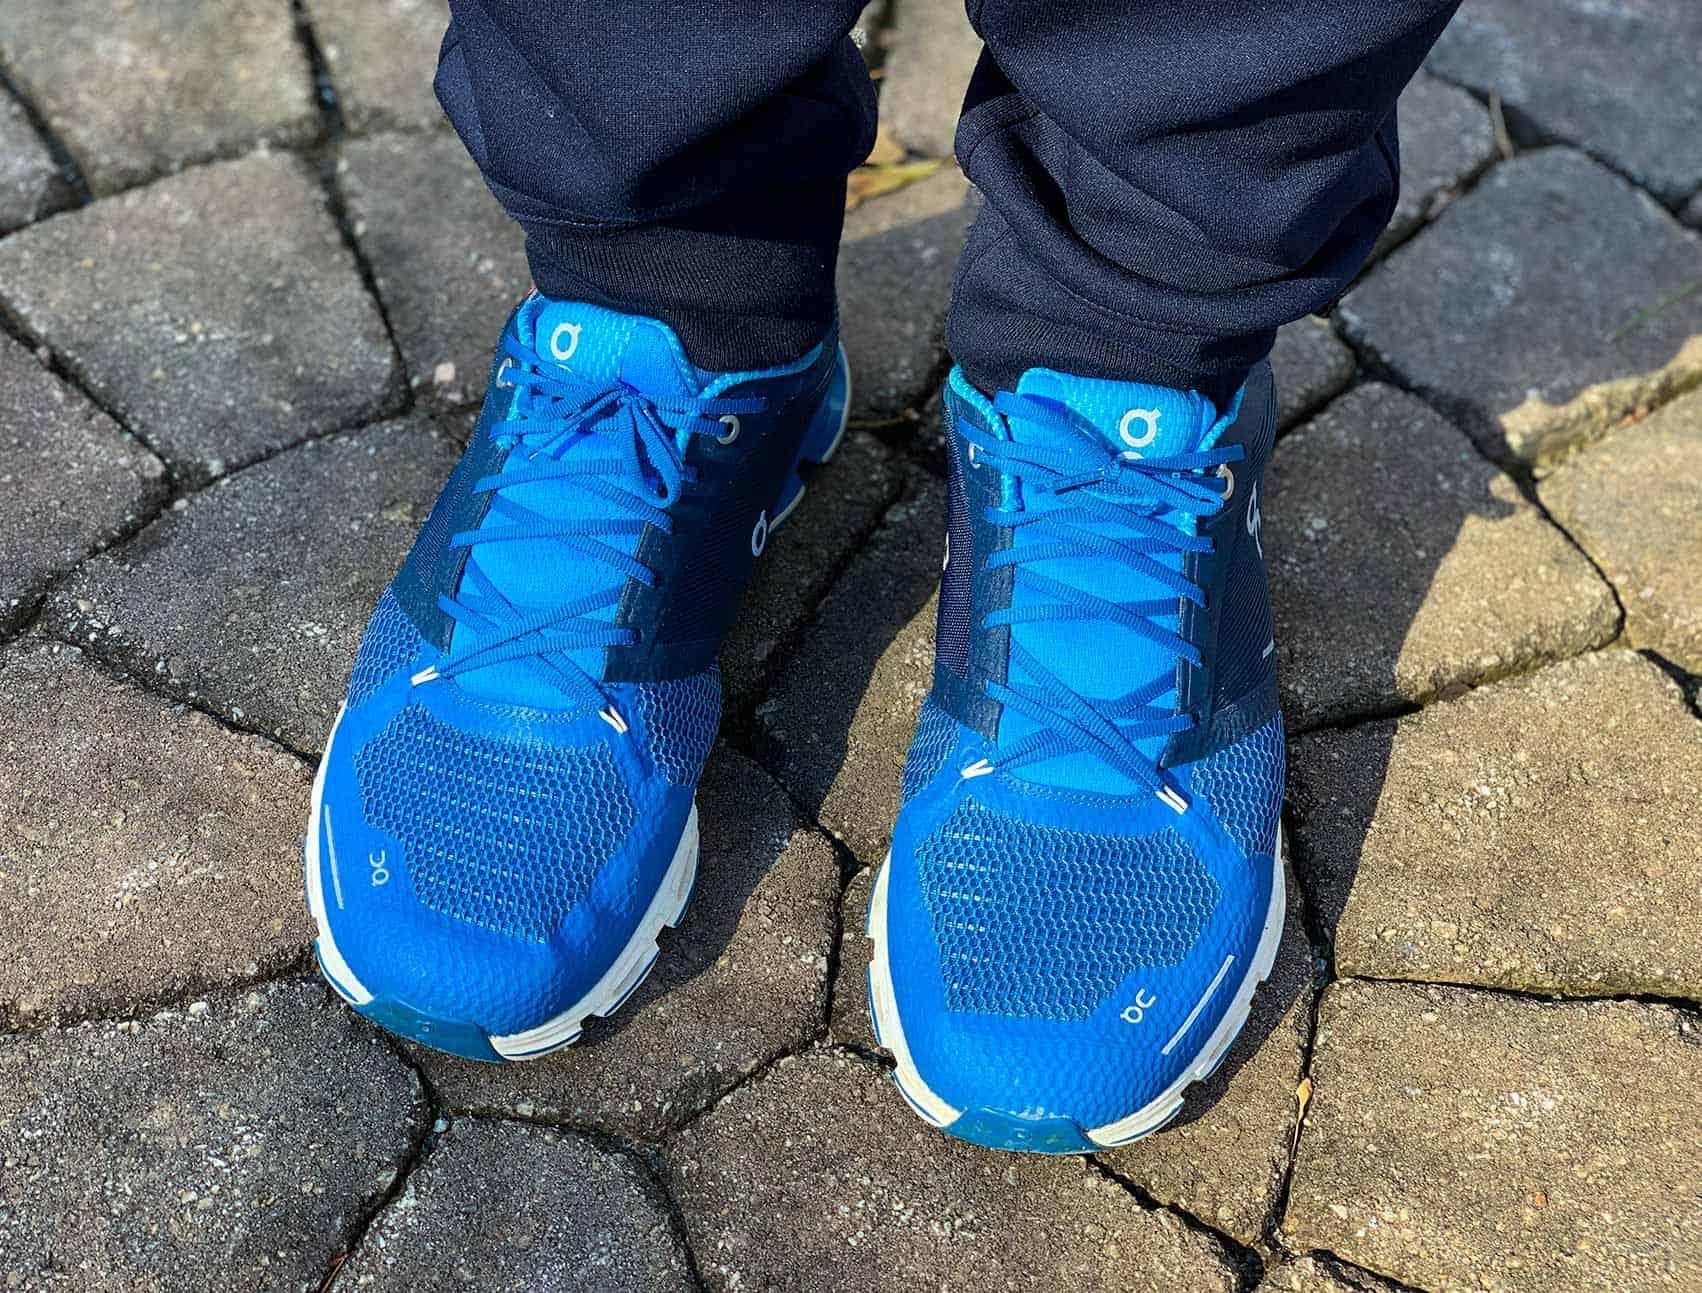 cloudflyer shoe review